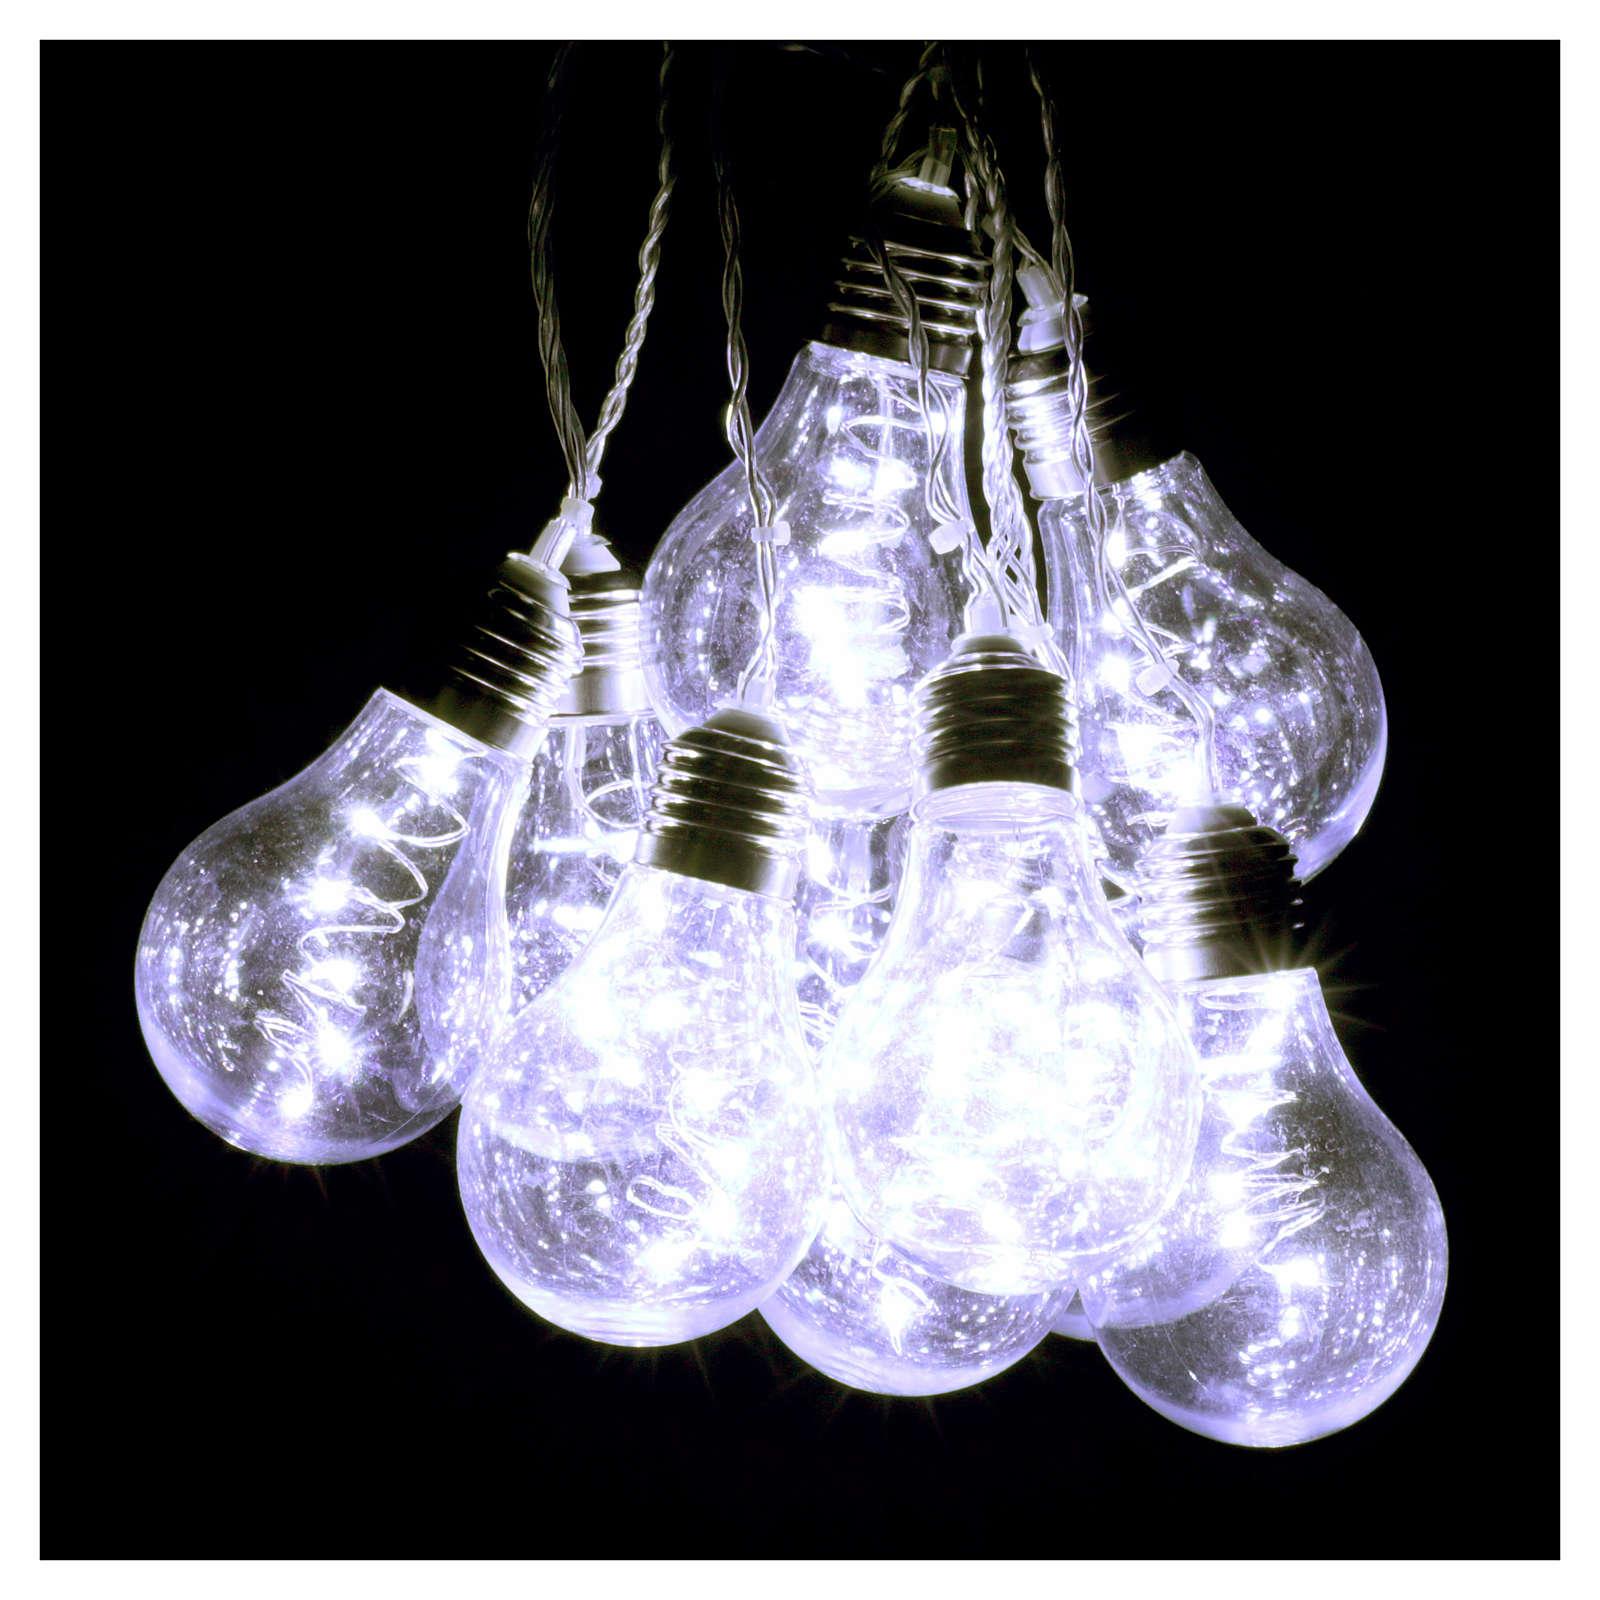 Cortina luminosa 10 bombillas 60 Nanoled hielo interior exterior 3